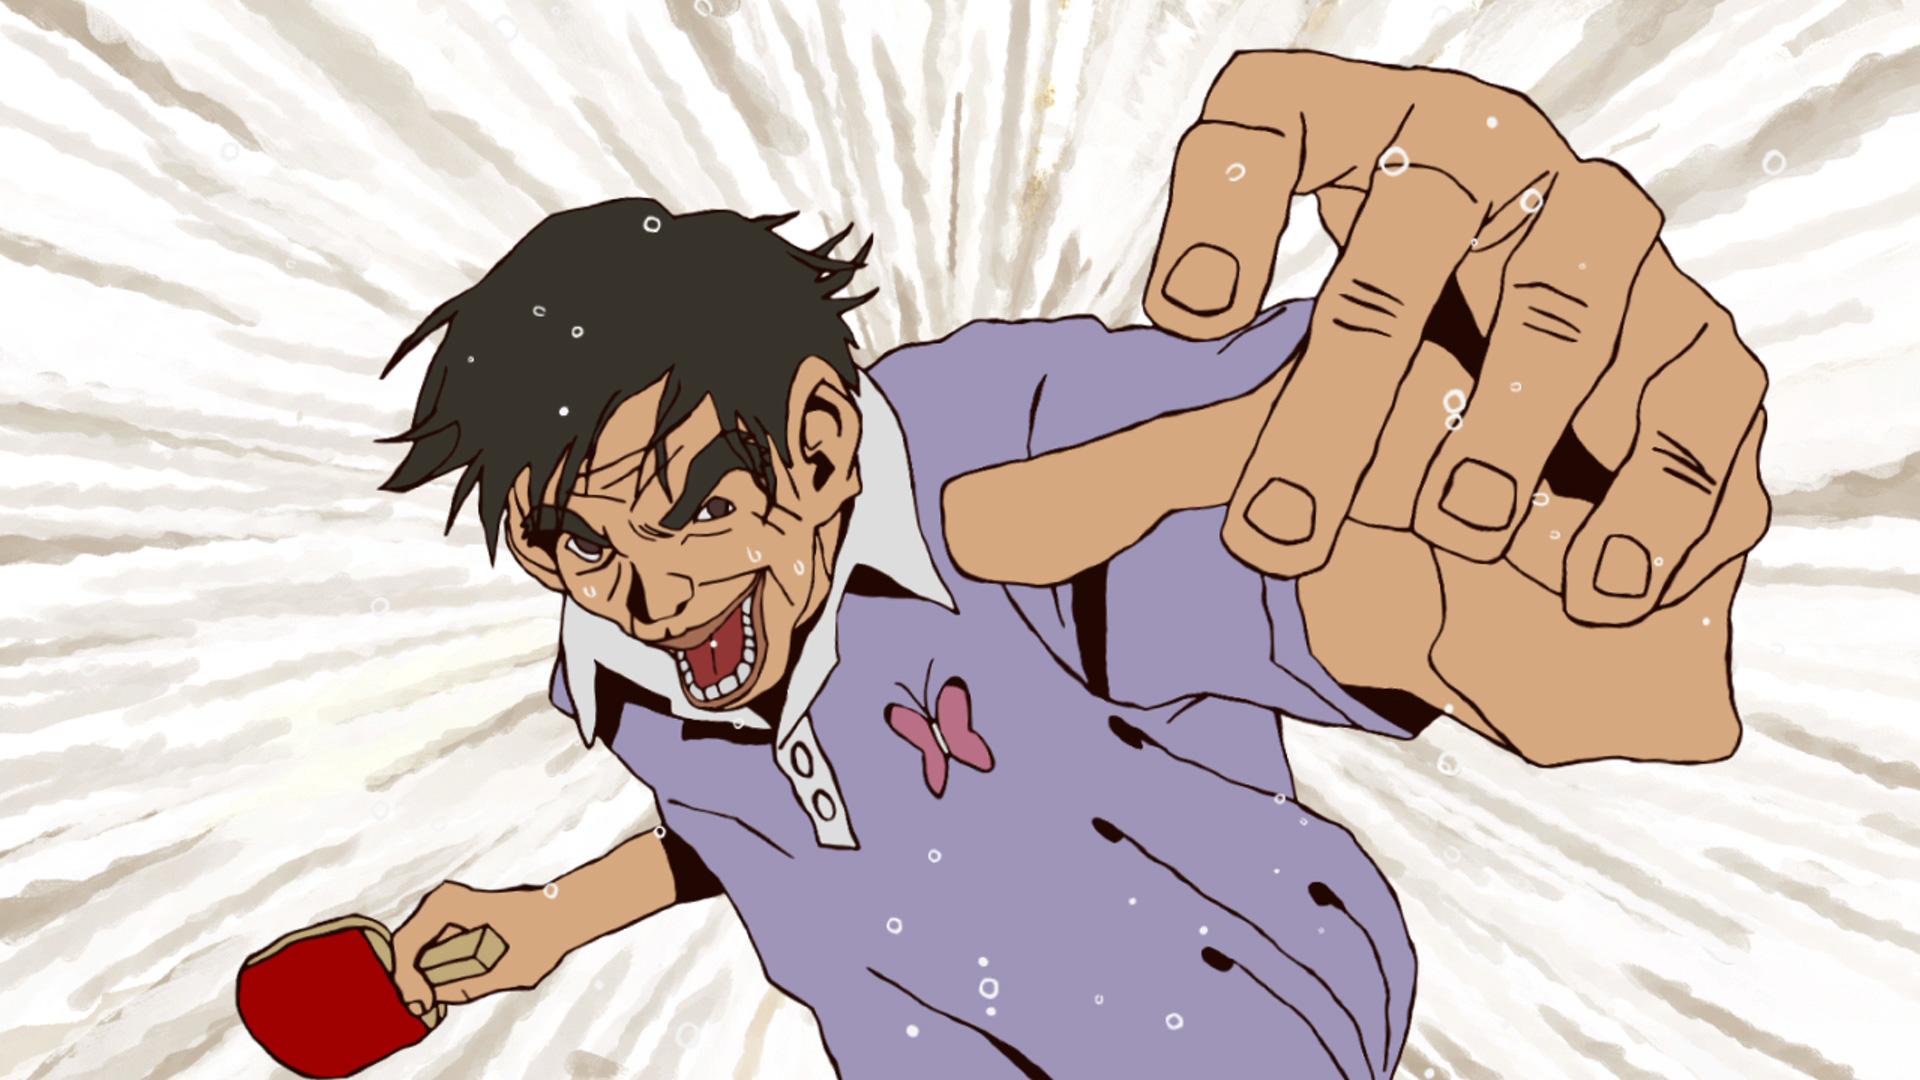 Watch Ping Pong The Animation Season 1 Episode 2 Sub Dub Anime